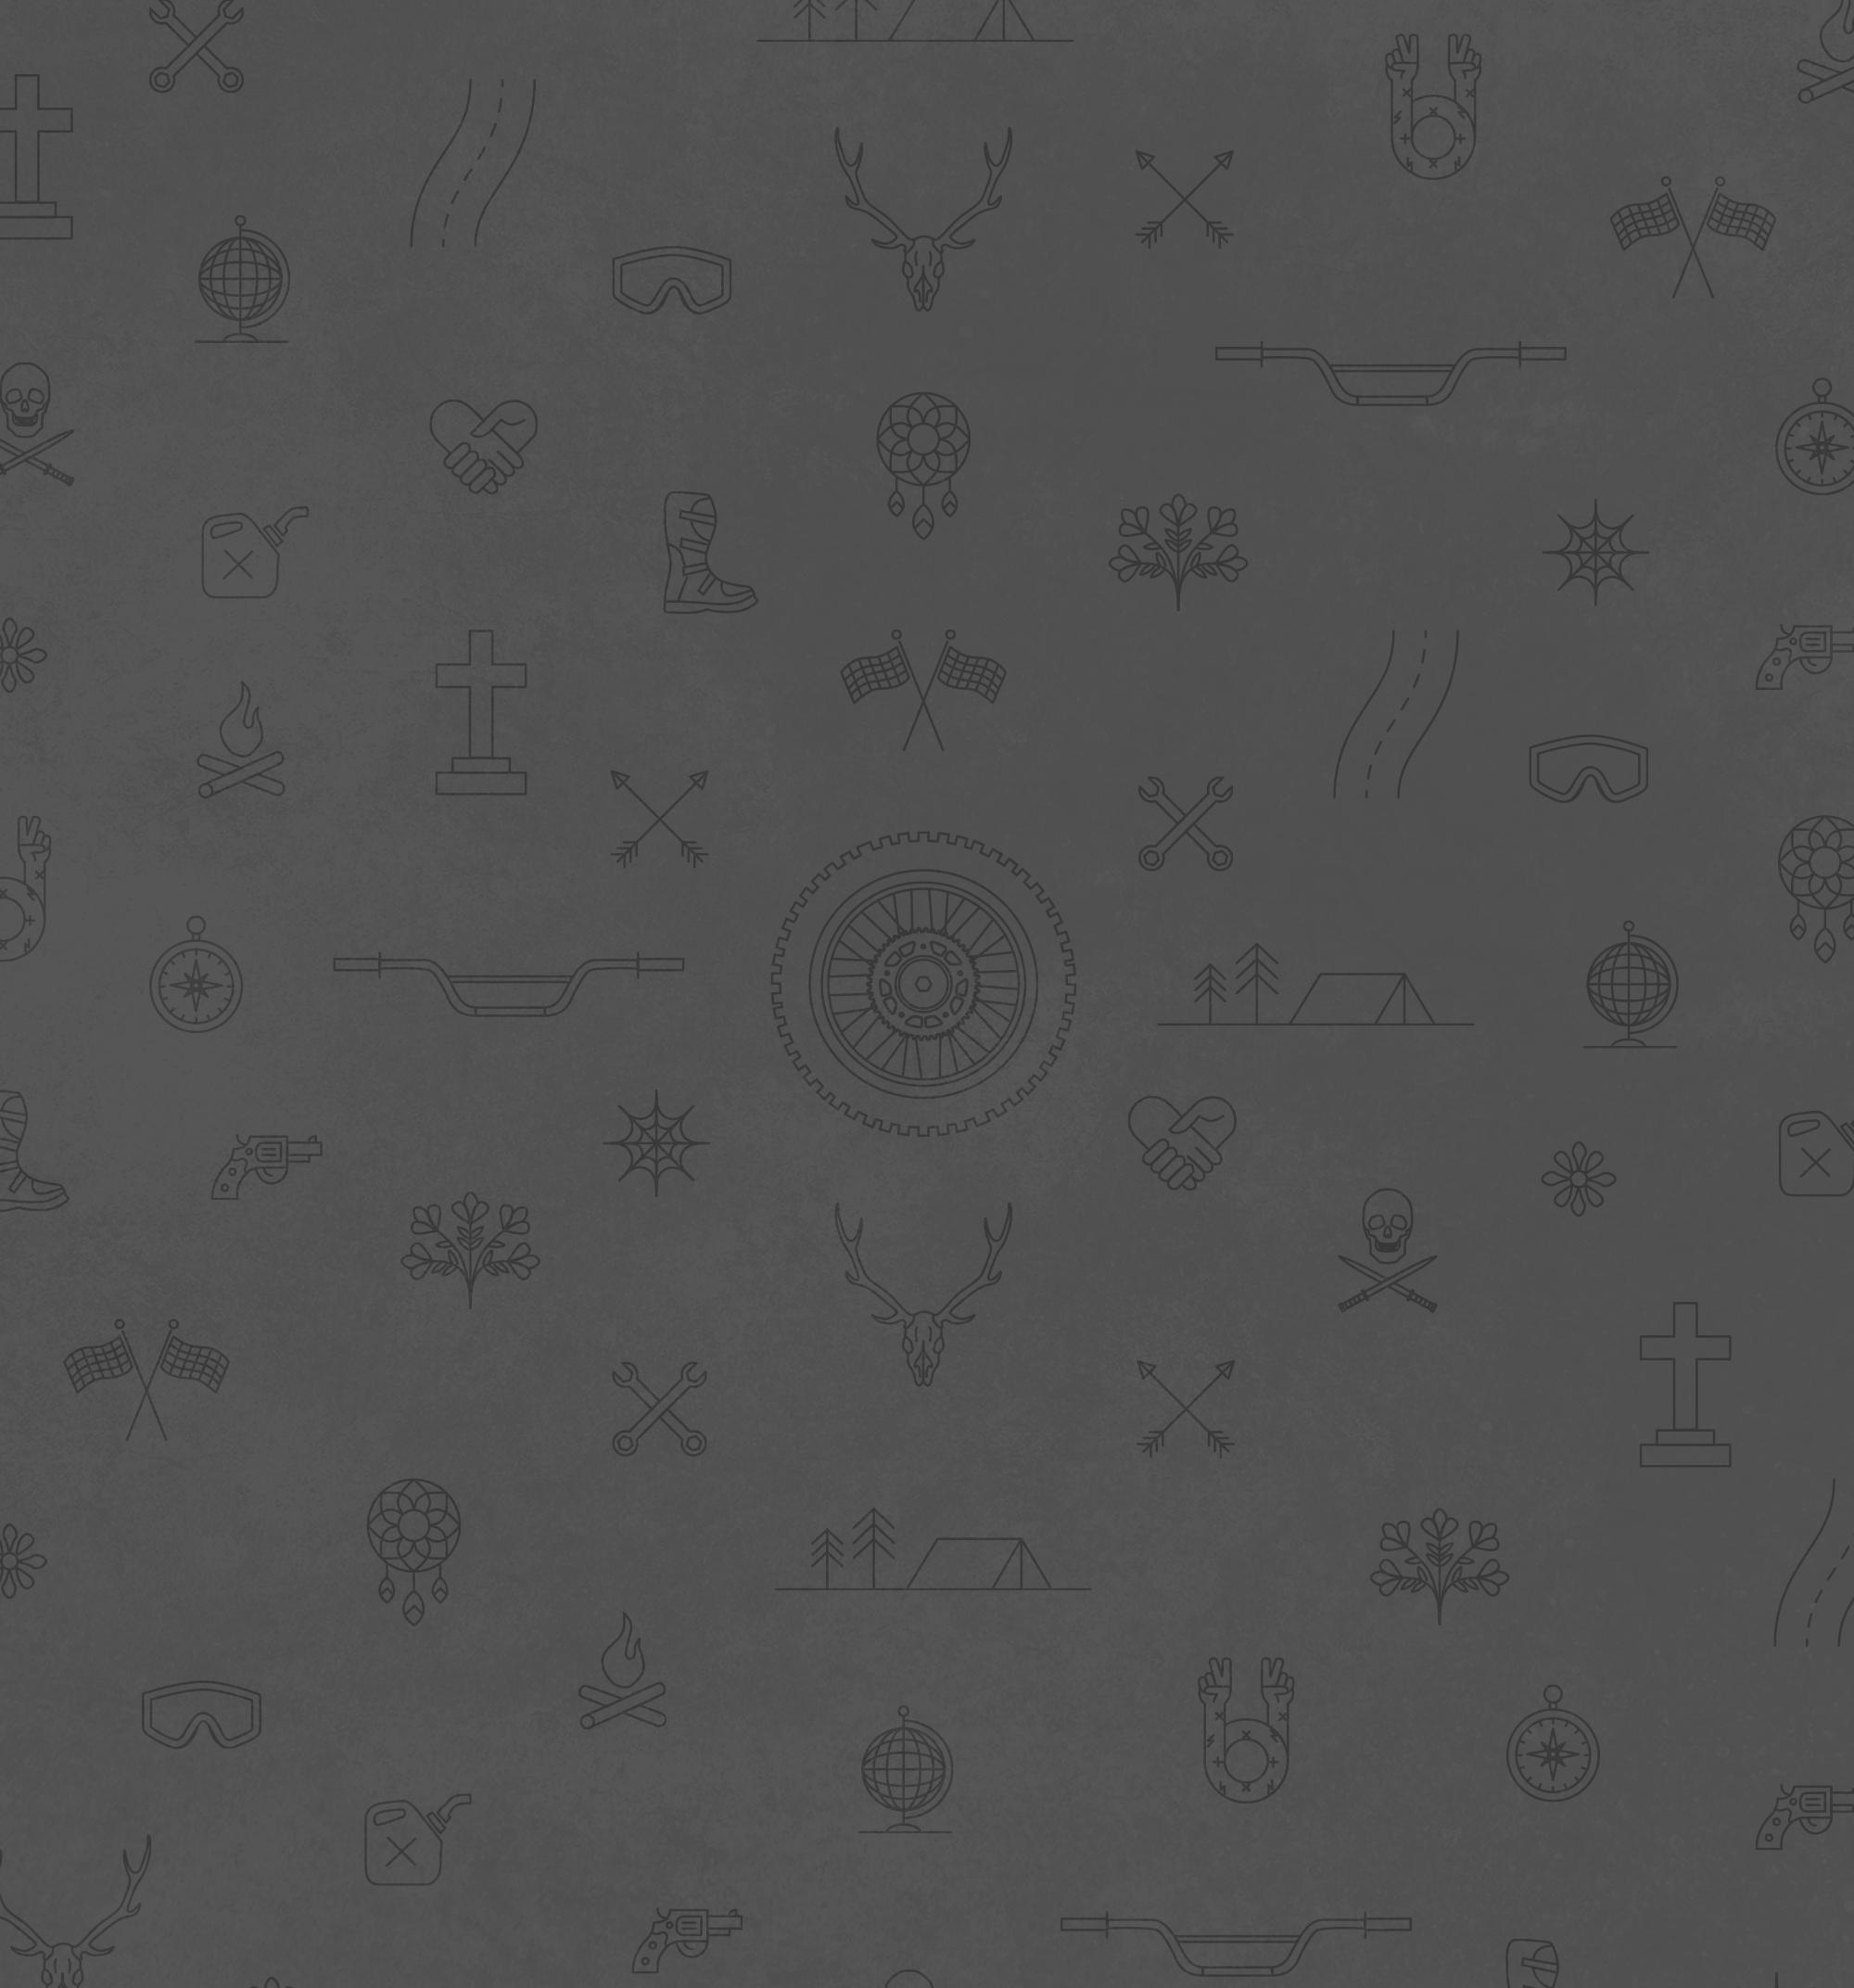 Landon Currier & LCATMX - MOTOCROSS CULTURE